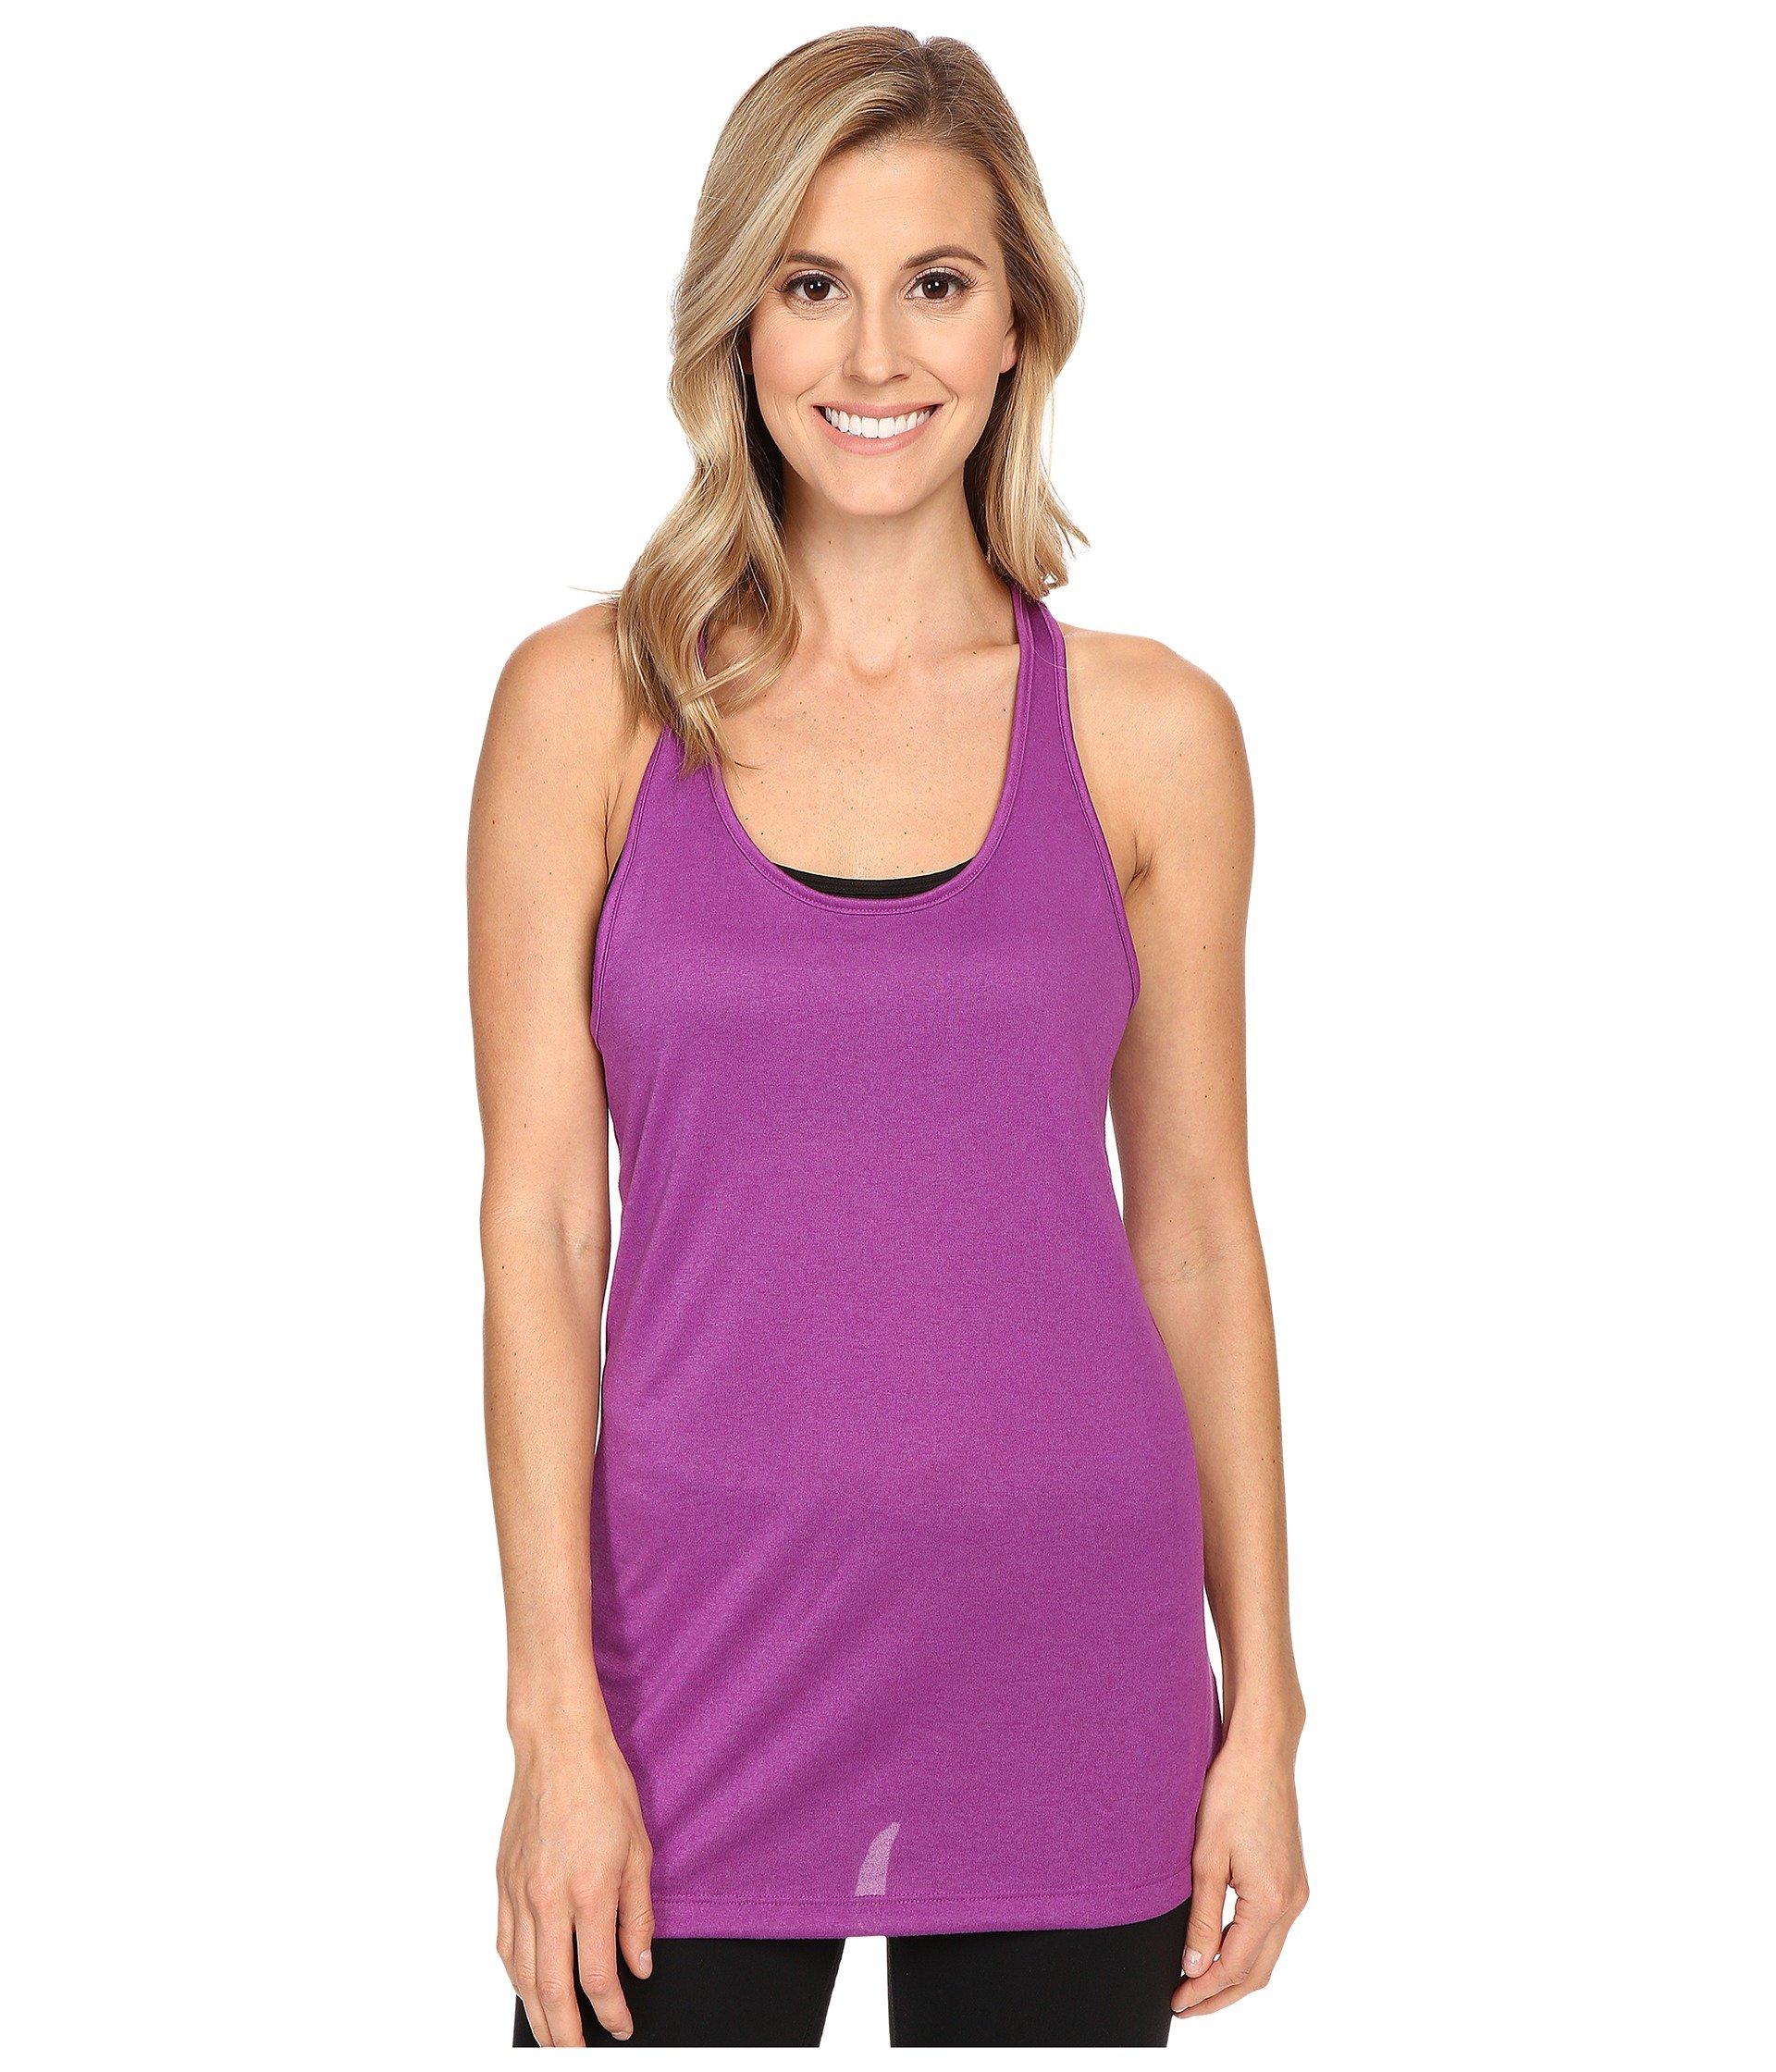 NIKE Women's Dry Balance Tank, Cosmic Purple/Cosmic Purple, X-Small